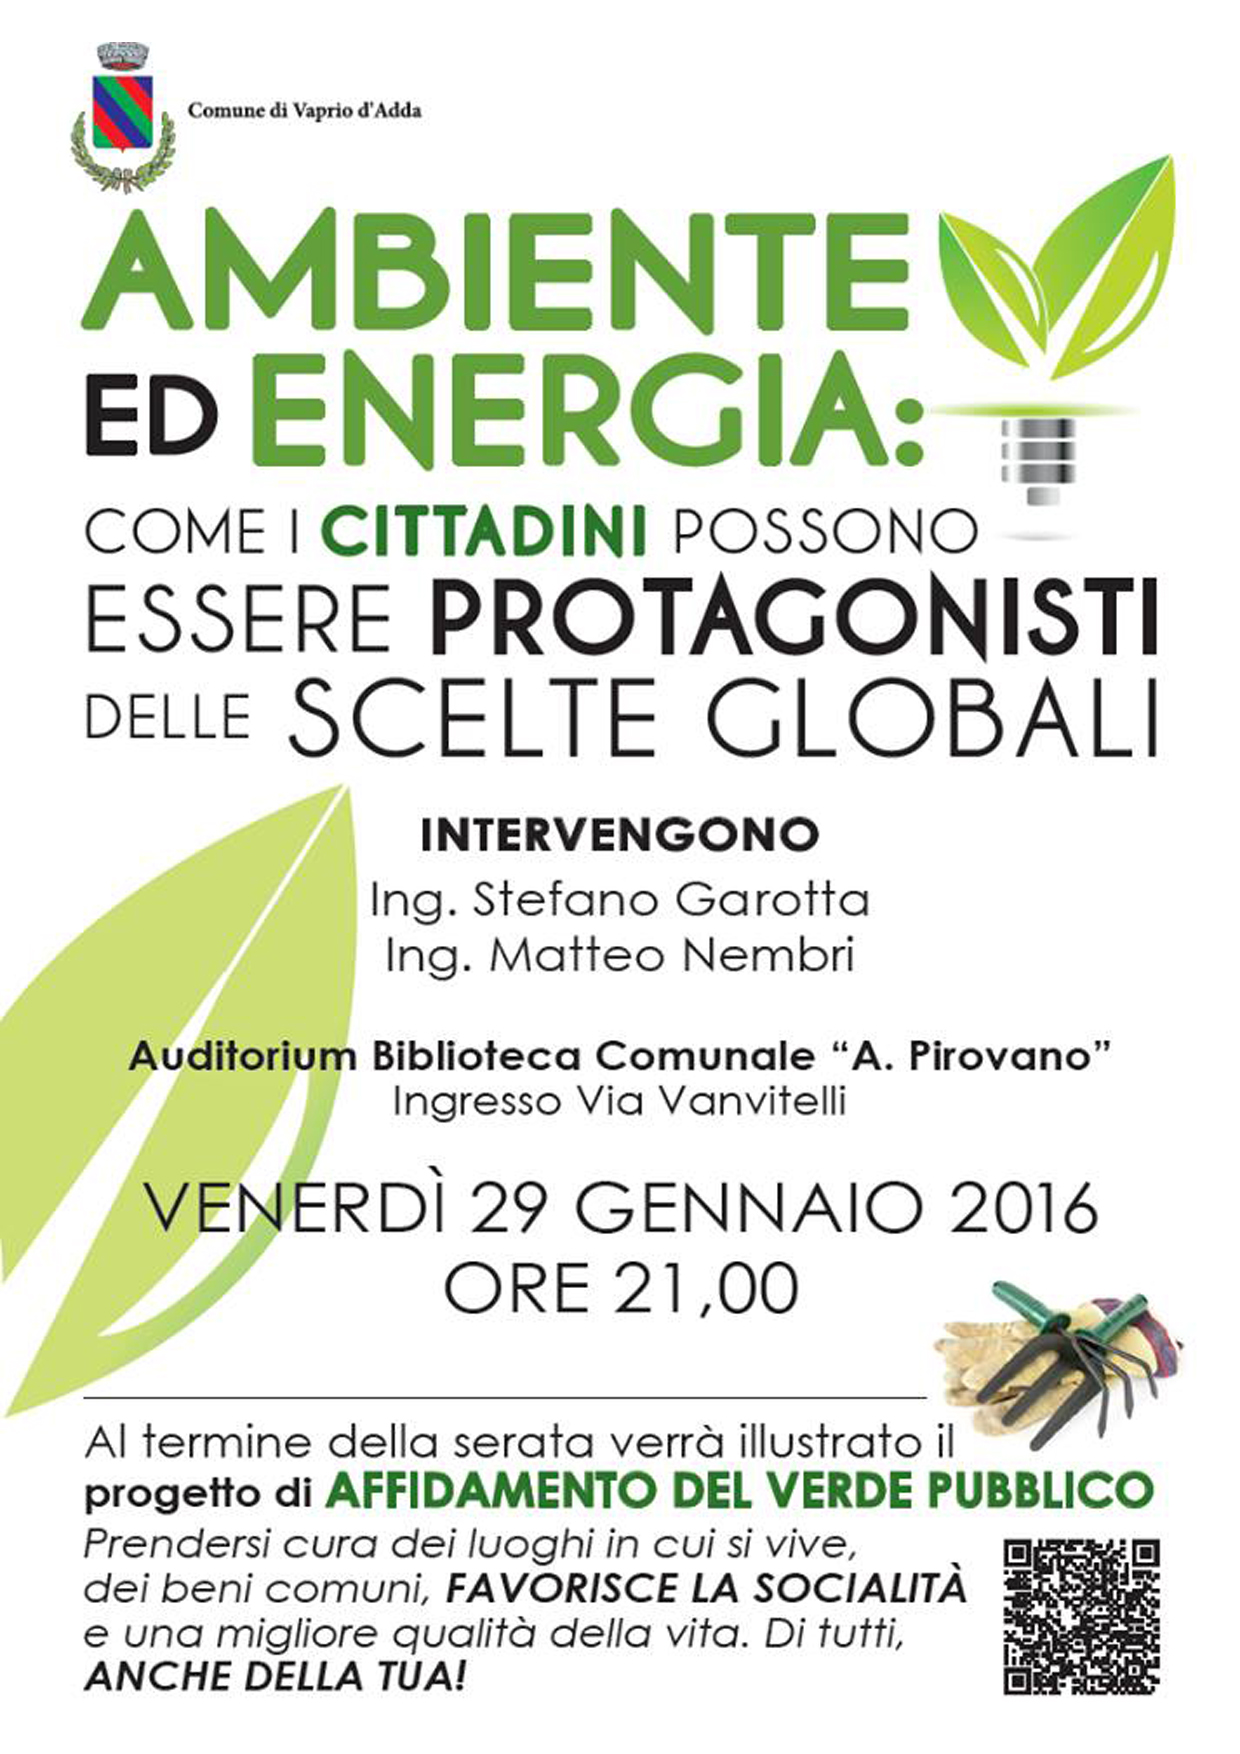 Ambiente Energia